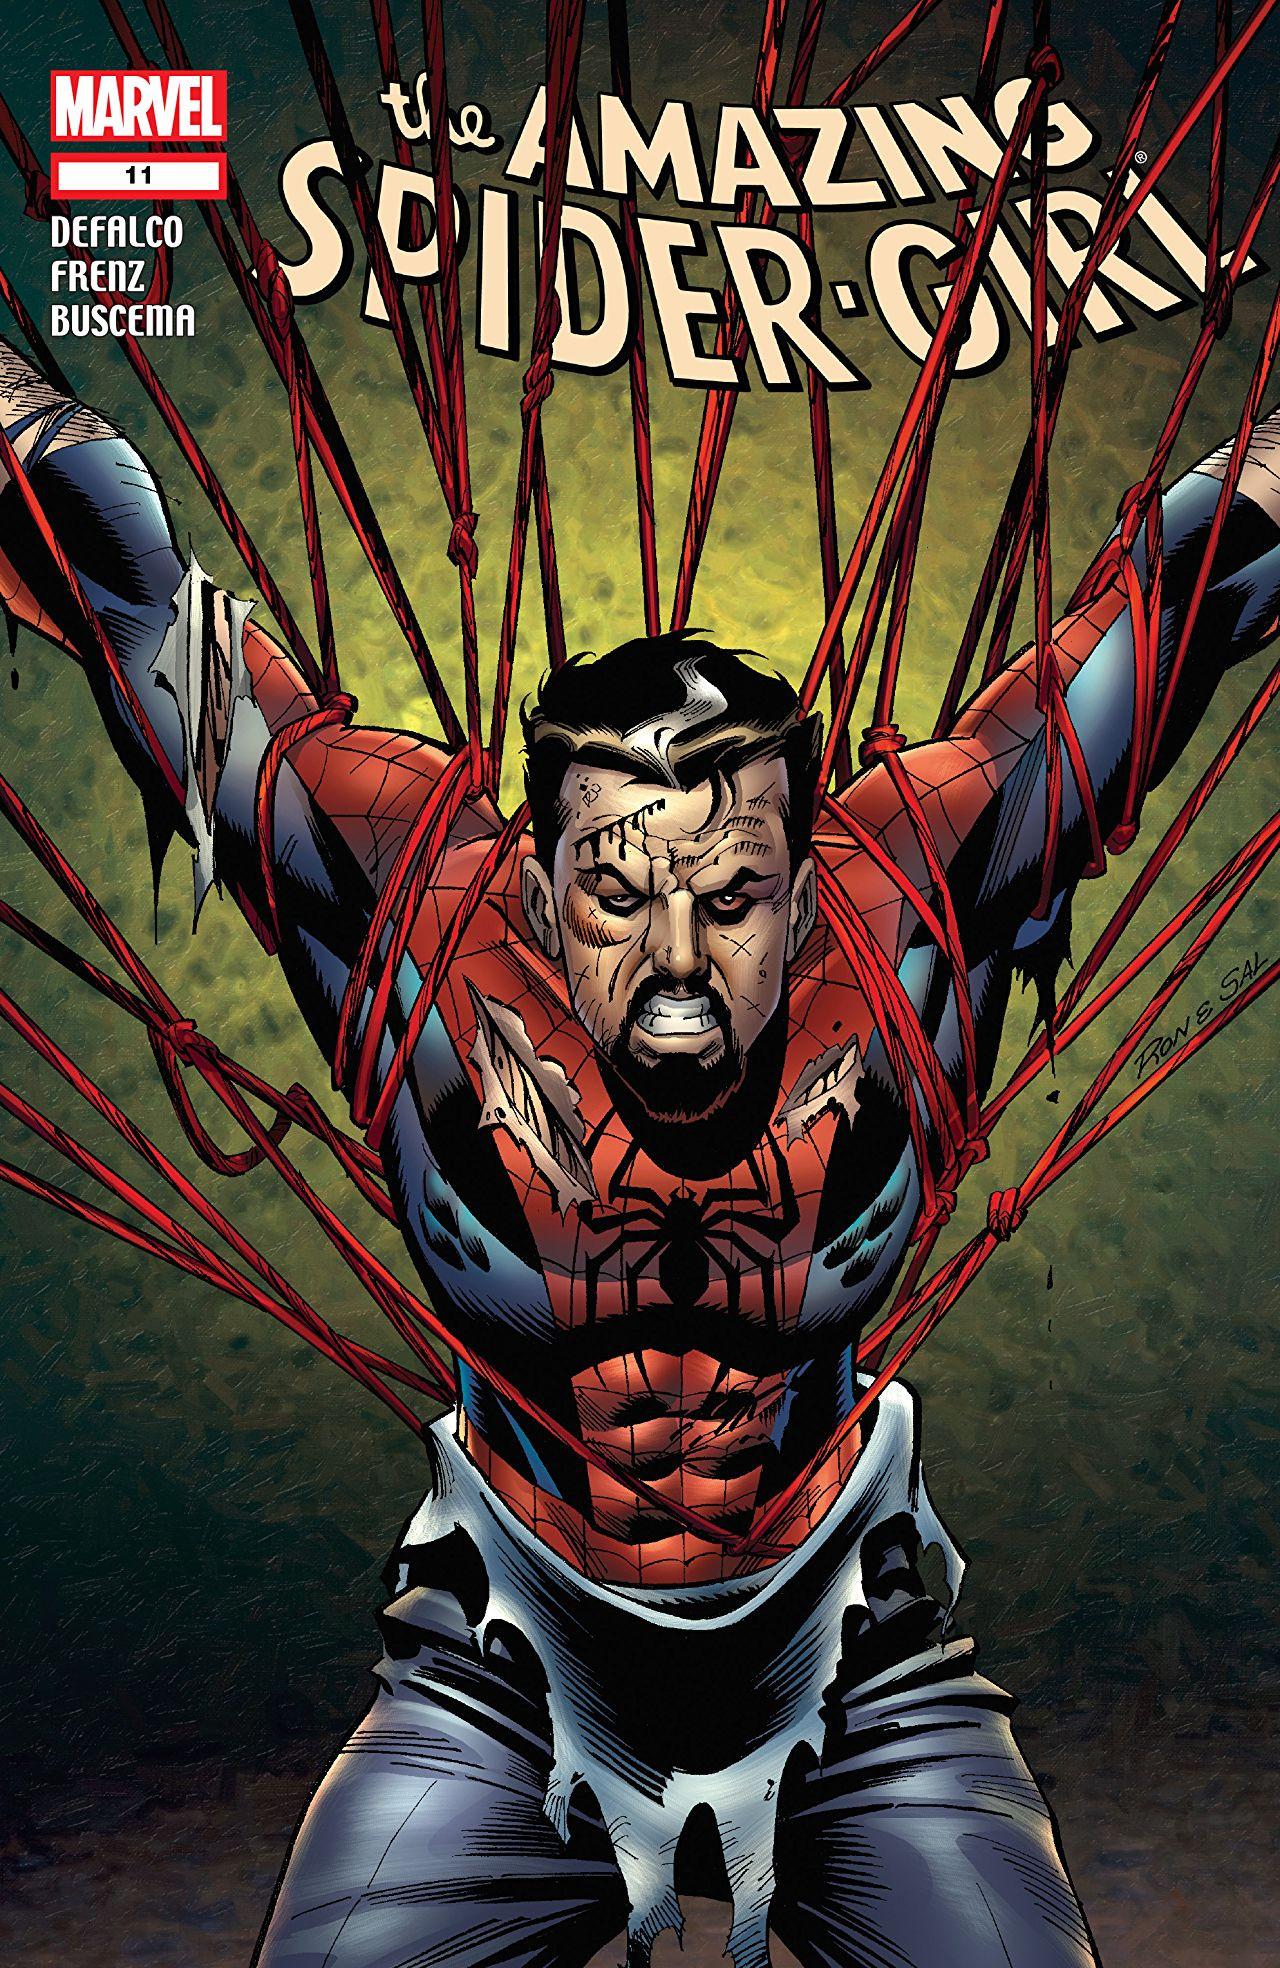 Amazing Spider-Girl Vol 1 11